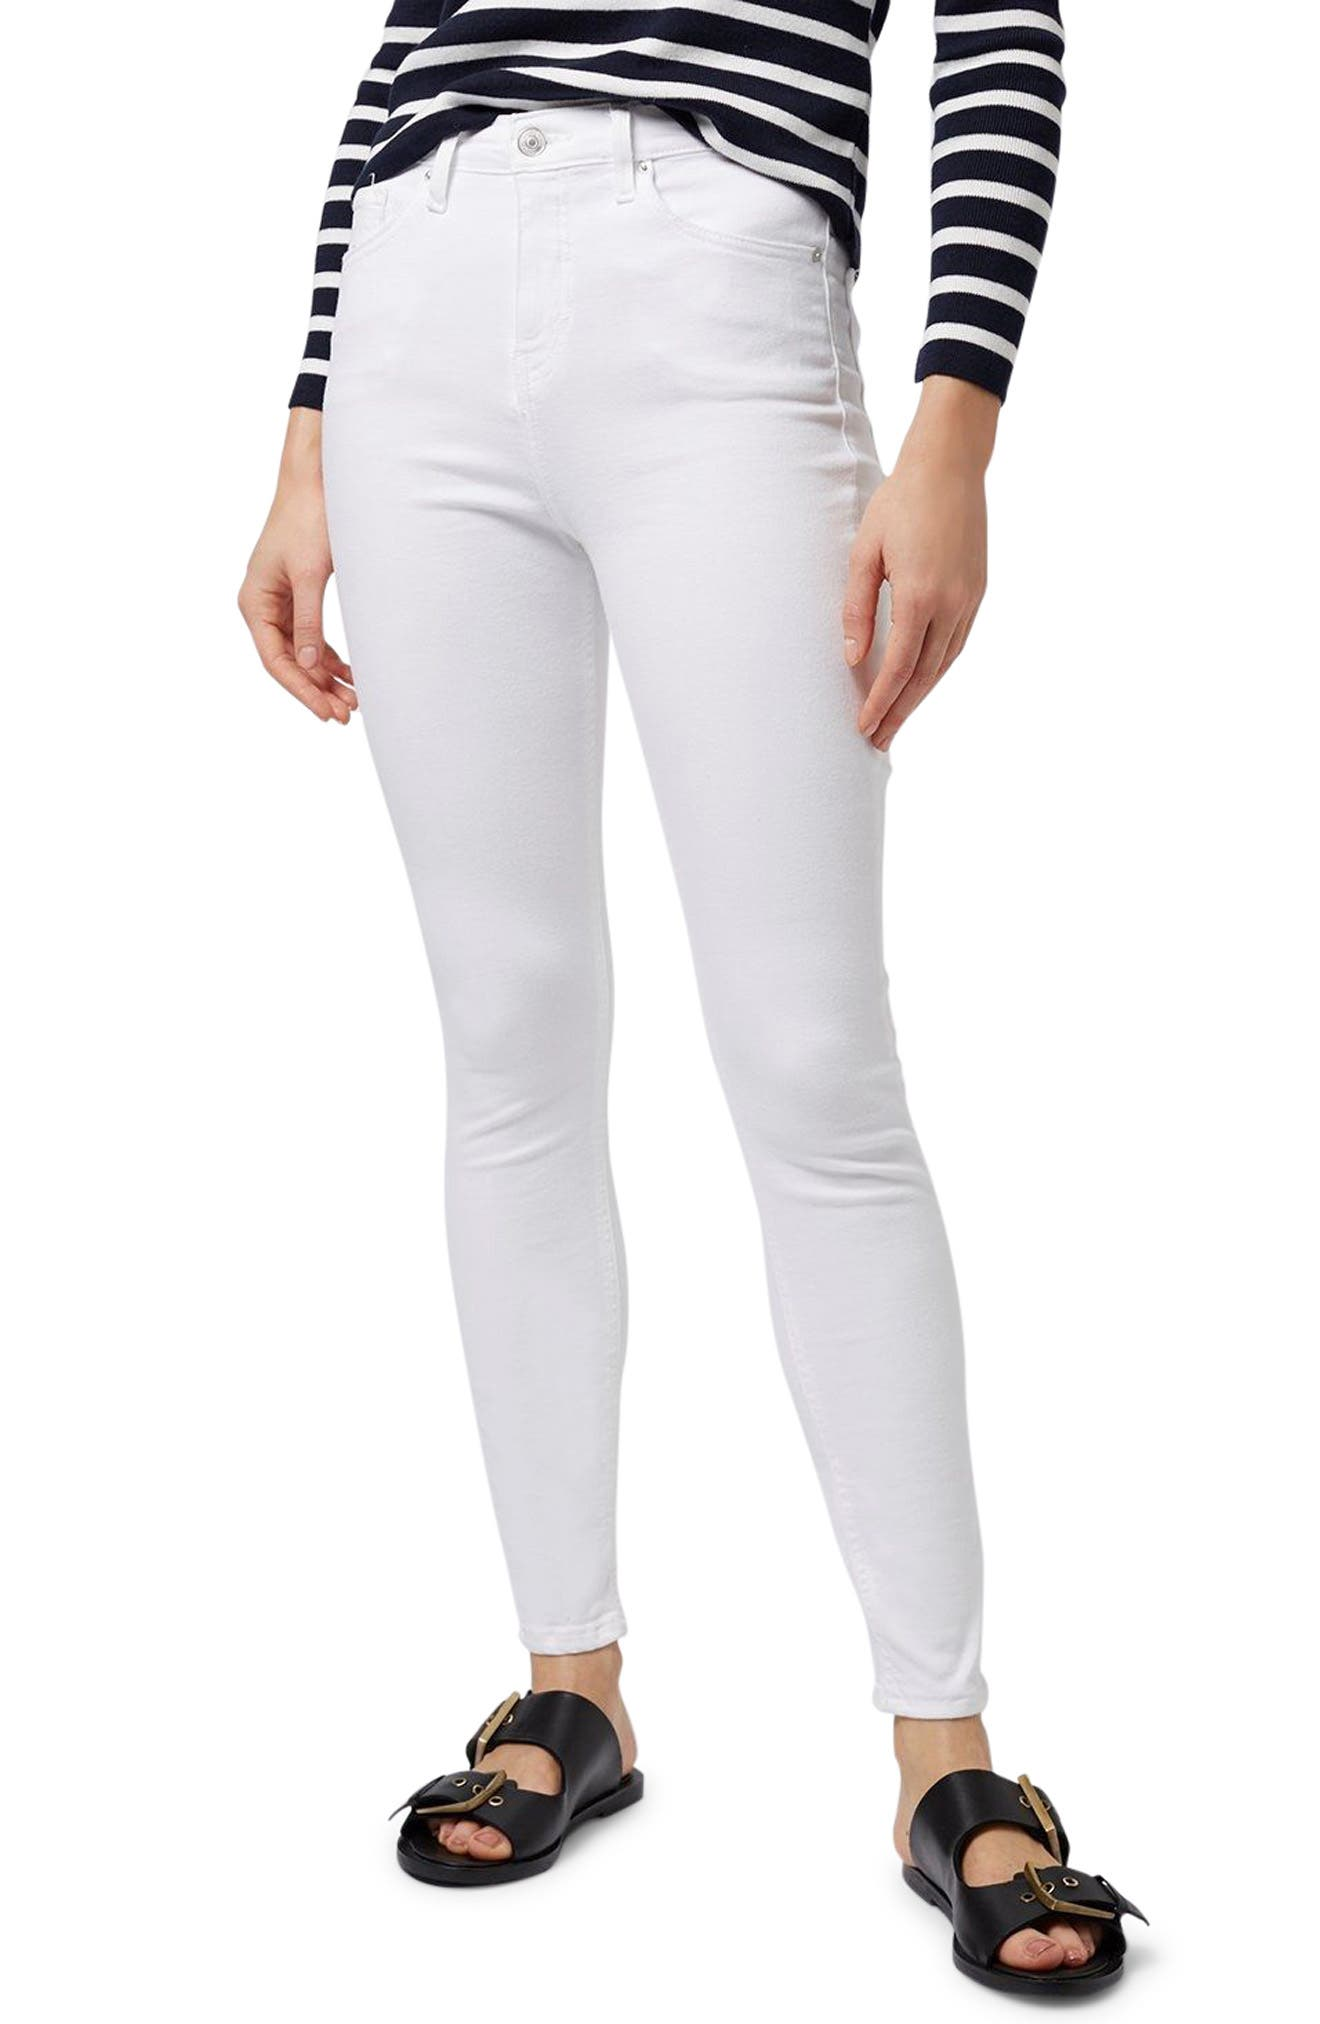 Moto Jamie Jeans,                             Main thumbnail 1, color,                             White